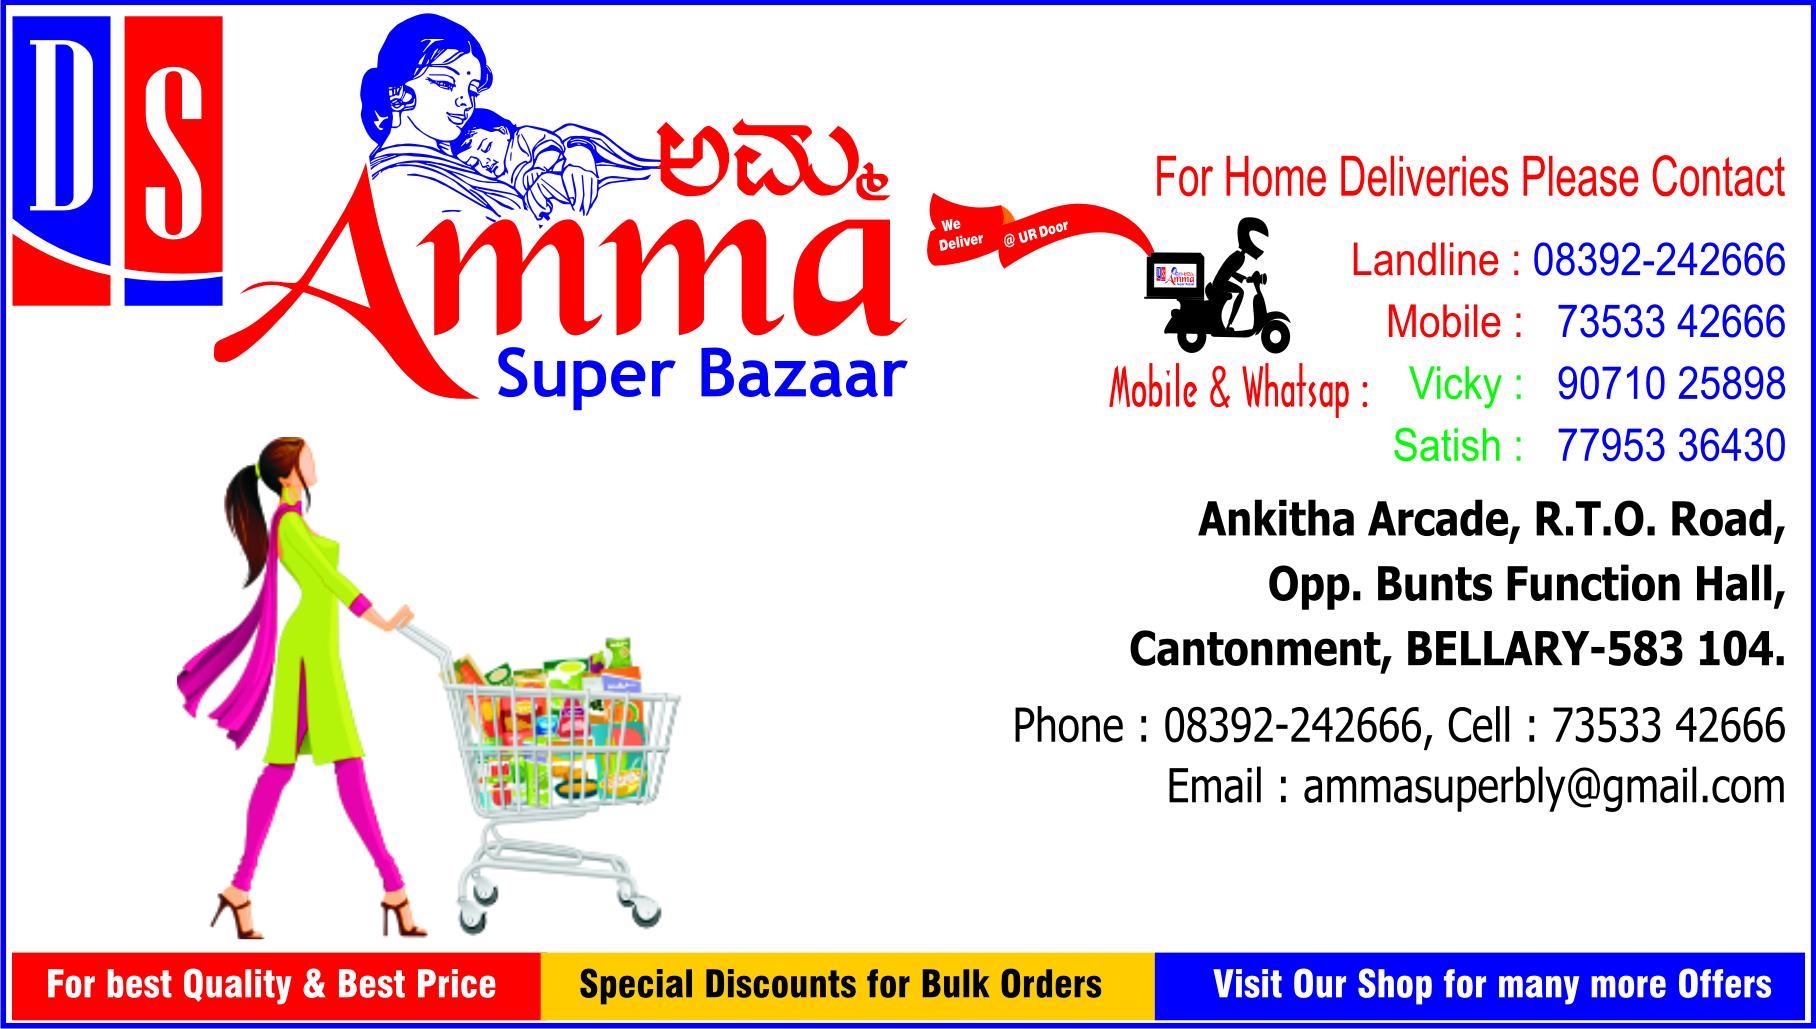 Amma Super Bazaar